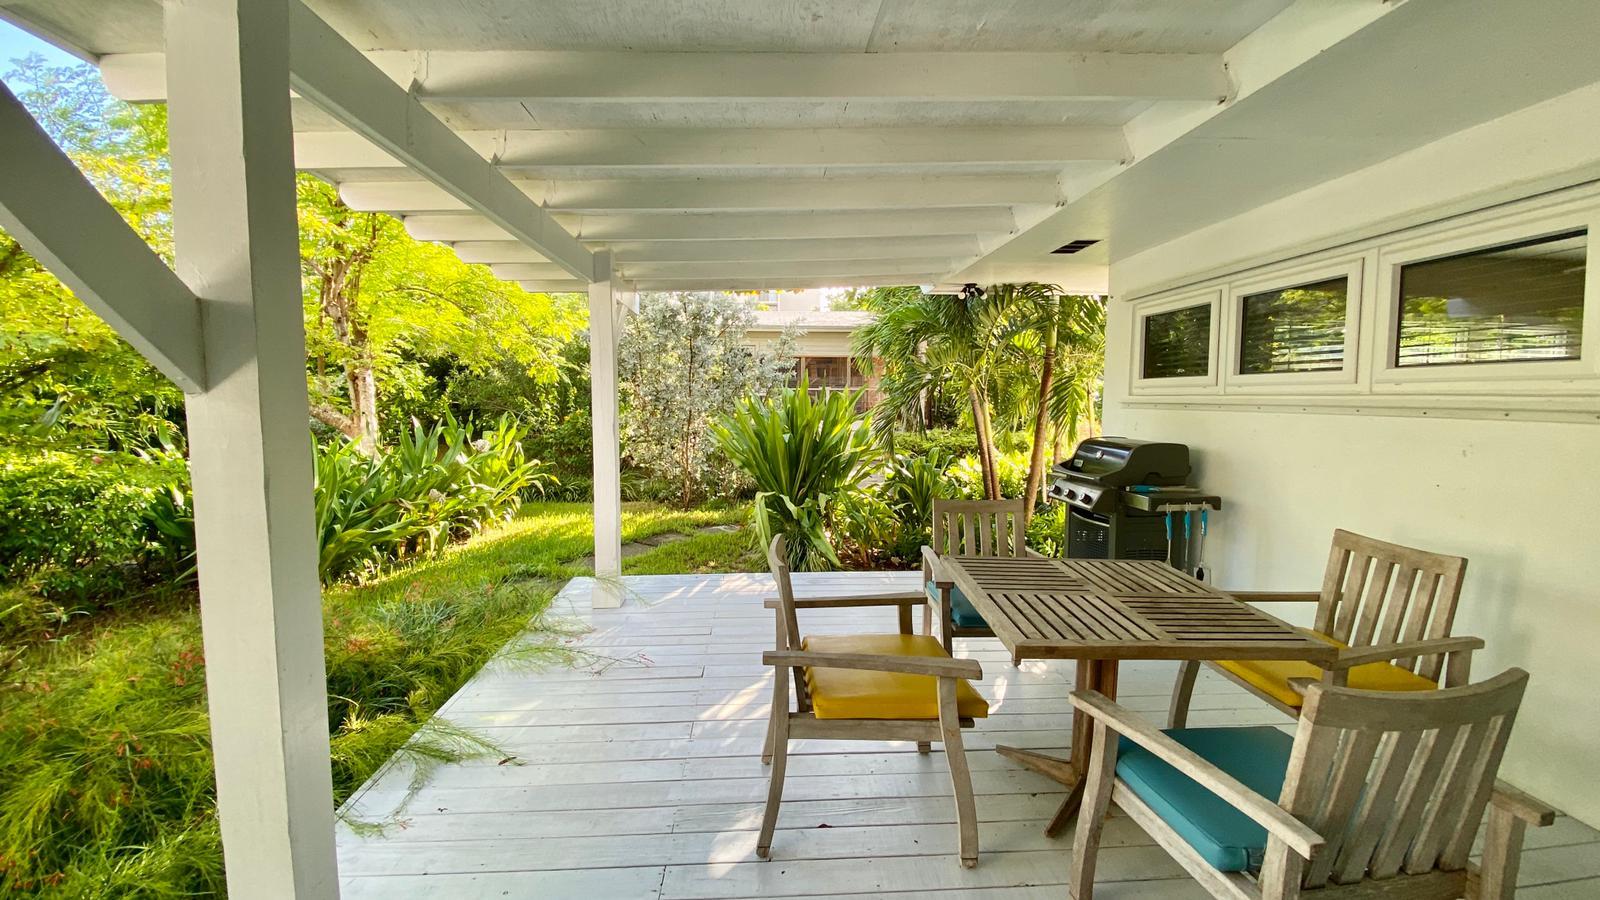 Lucayan Beach 2 Bed Apartment, Grand Bahama/Freeport, BS